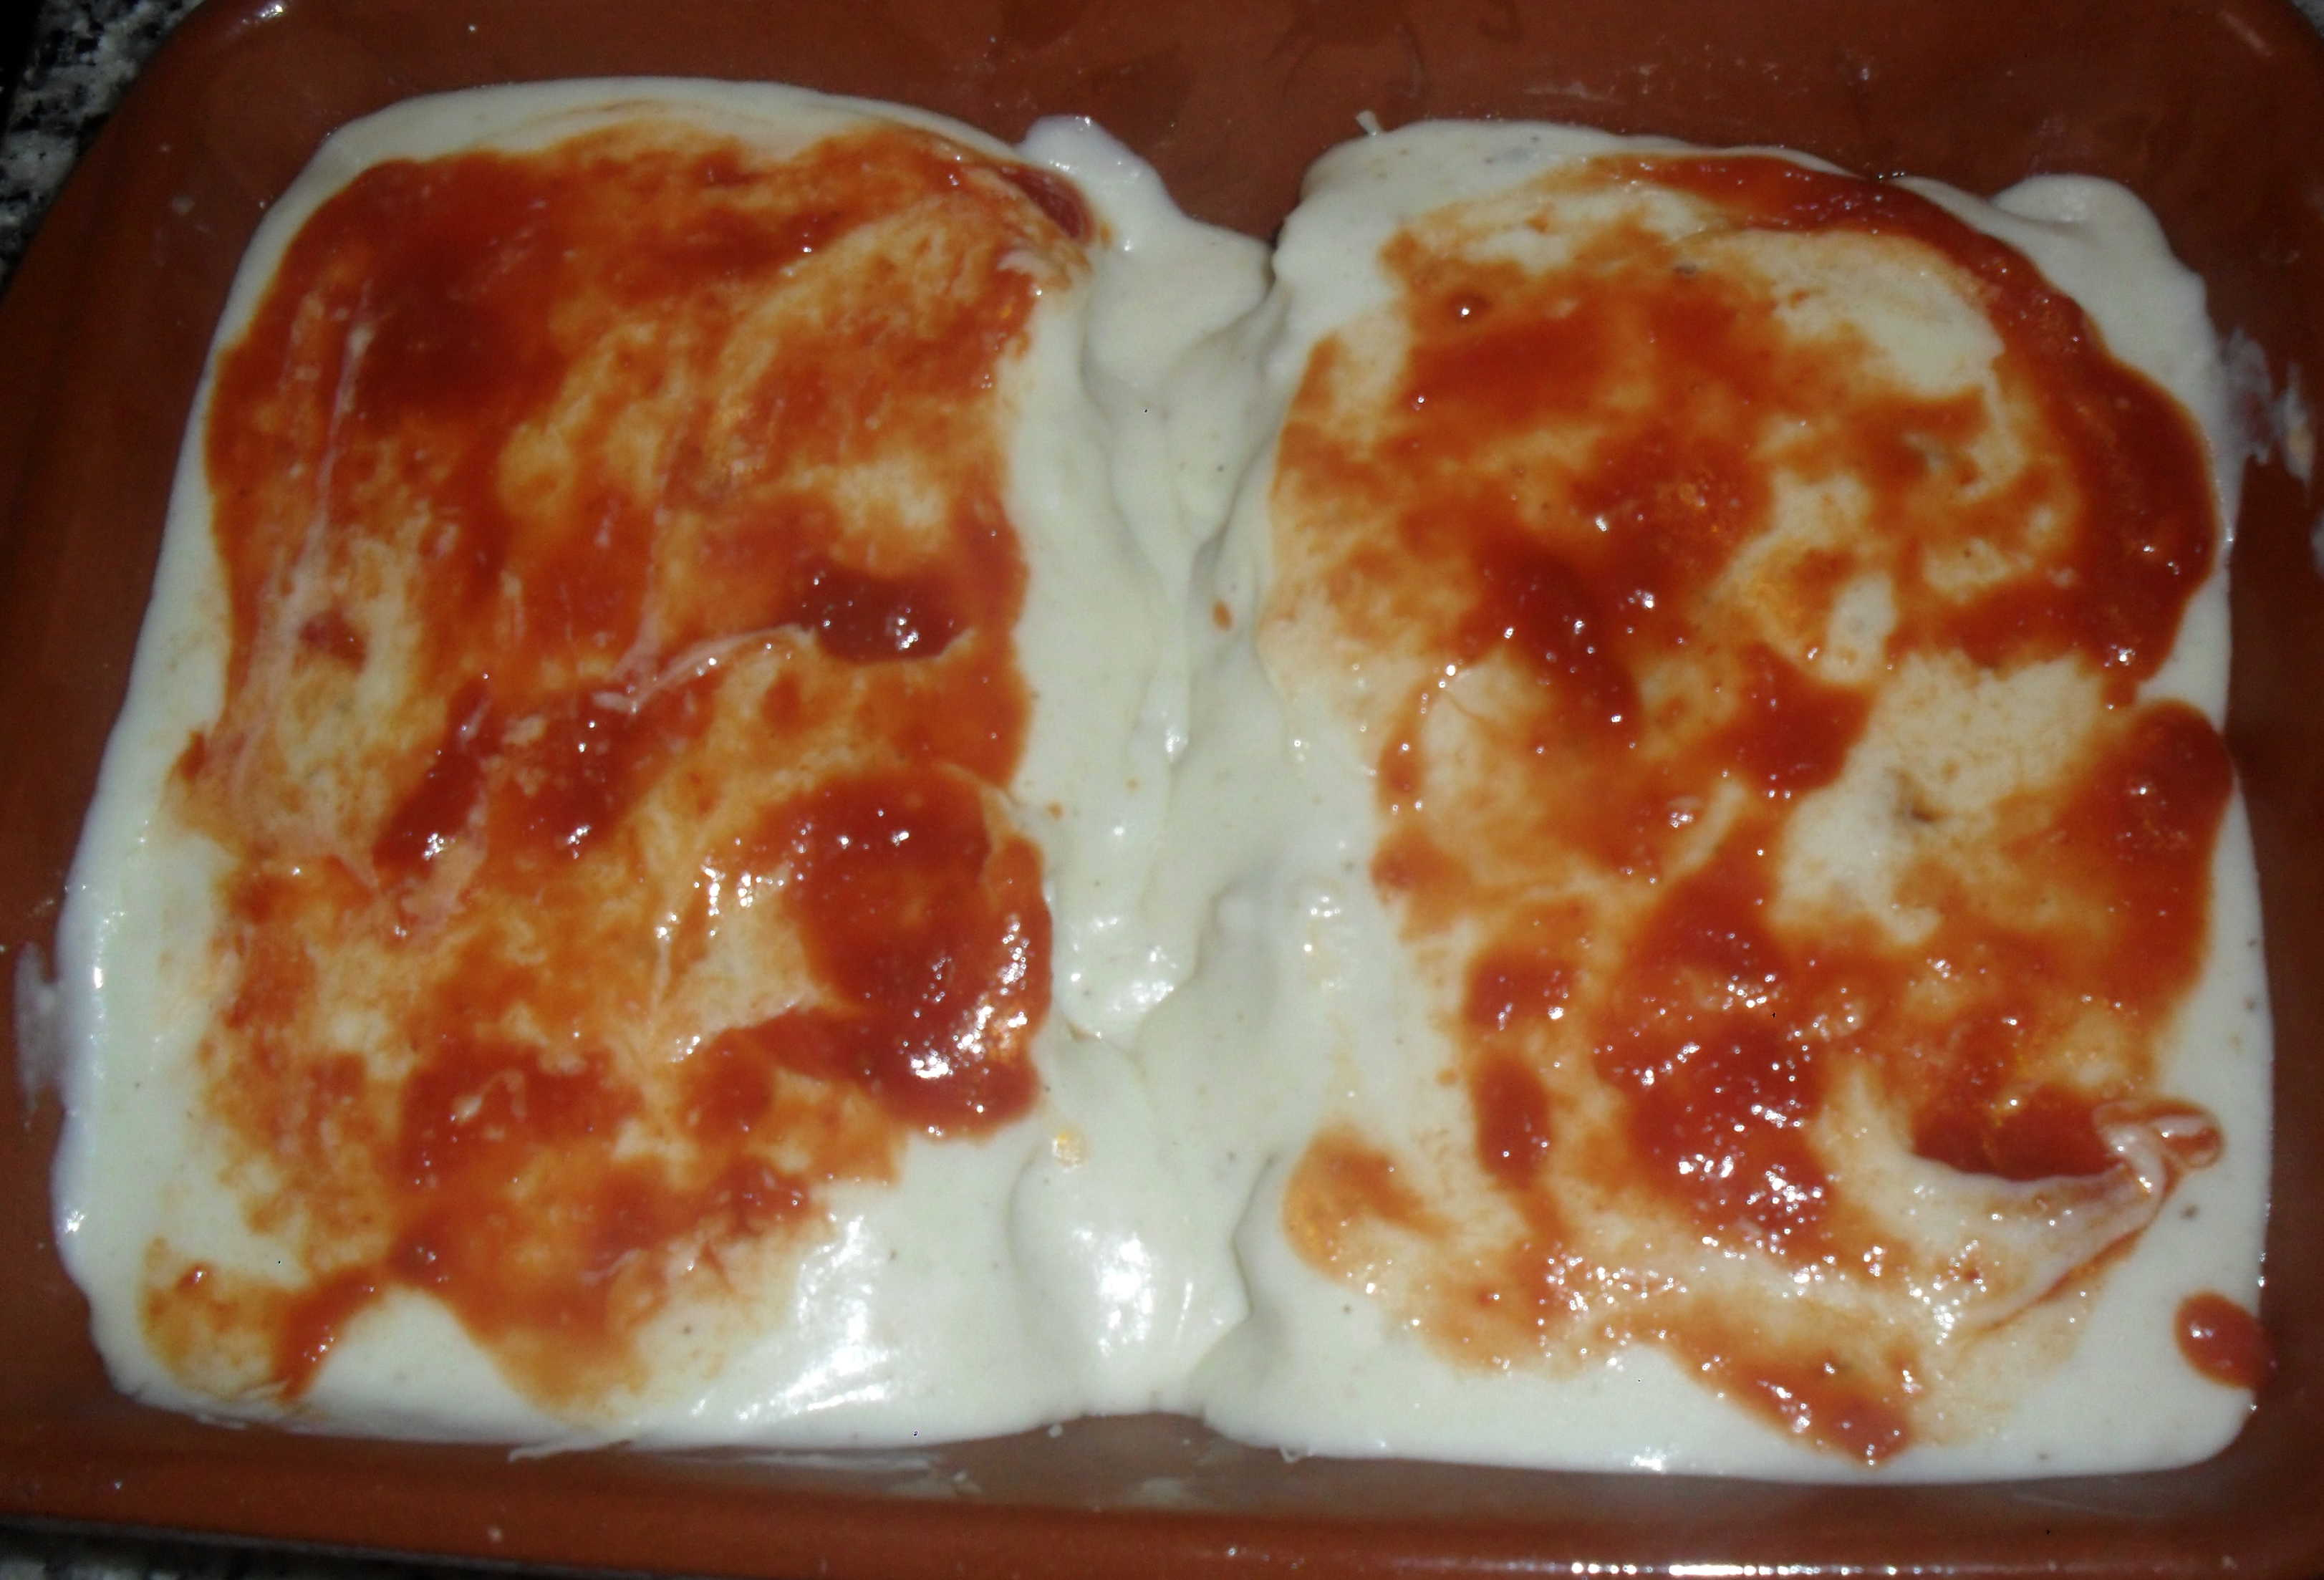 Canelones receta manetes bones - Canelones en microondas ...